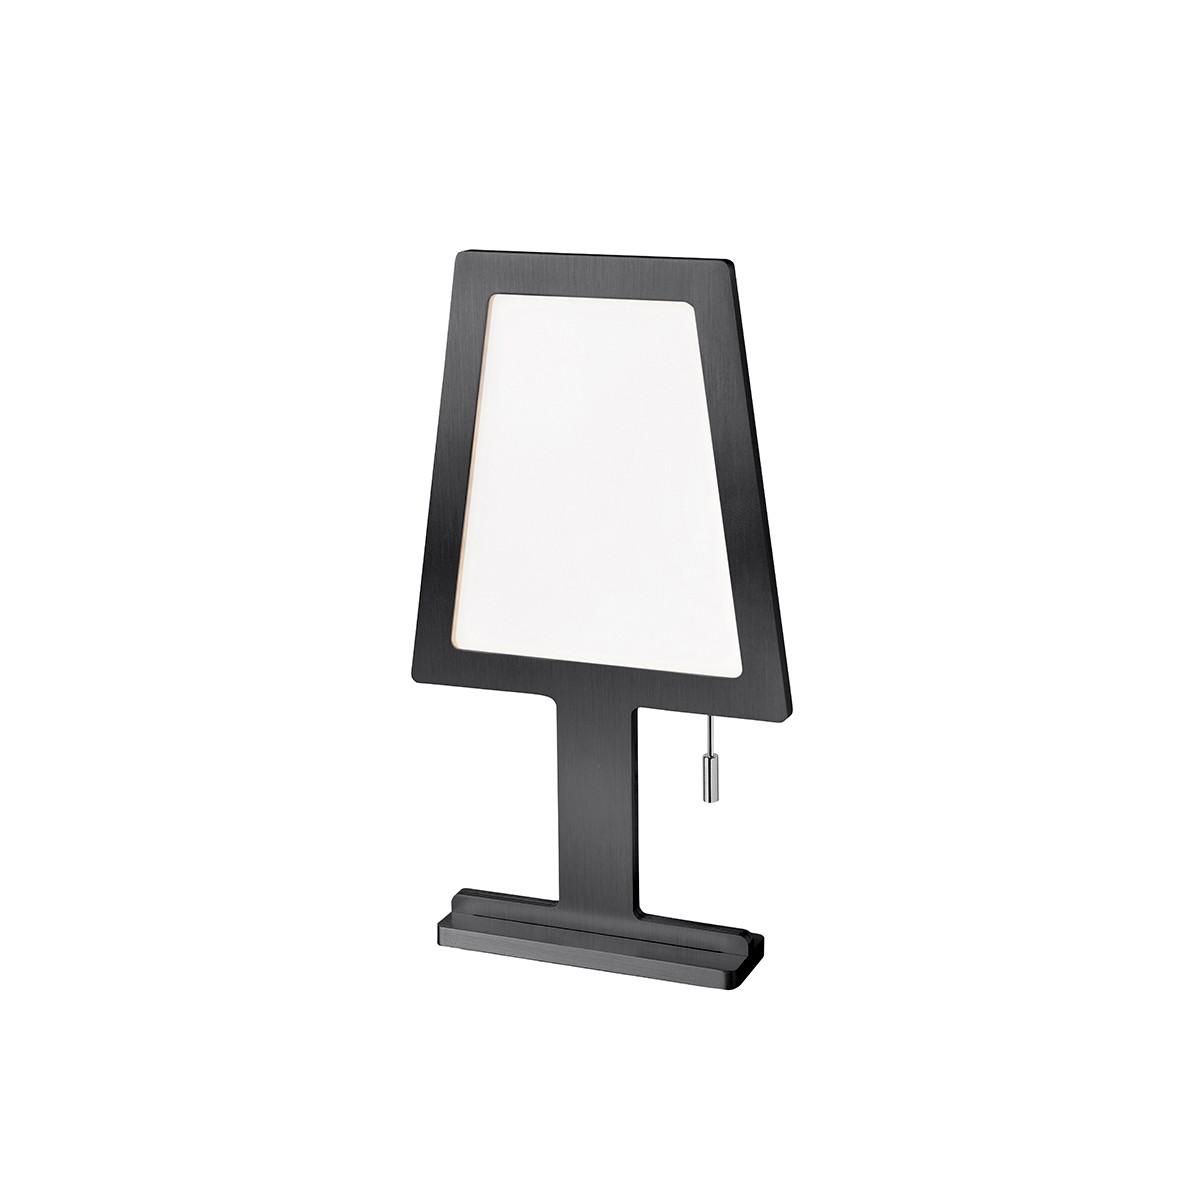 Sompex Steve LED Tischleuchte, schwarz